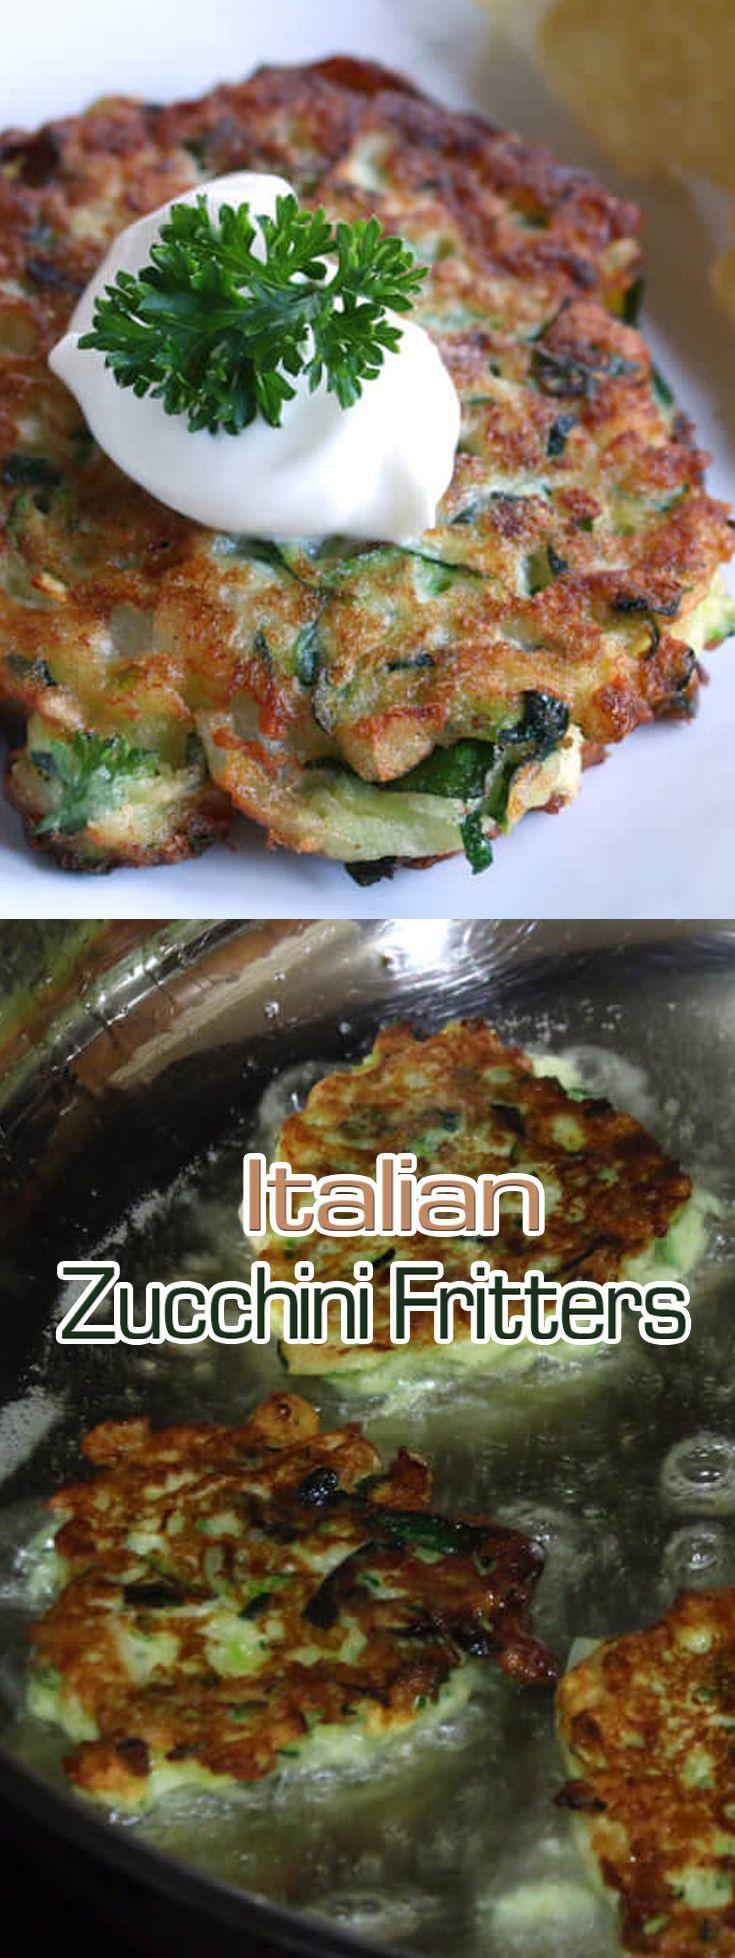 Italian Zucchini Fritters